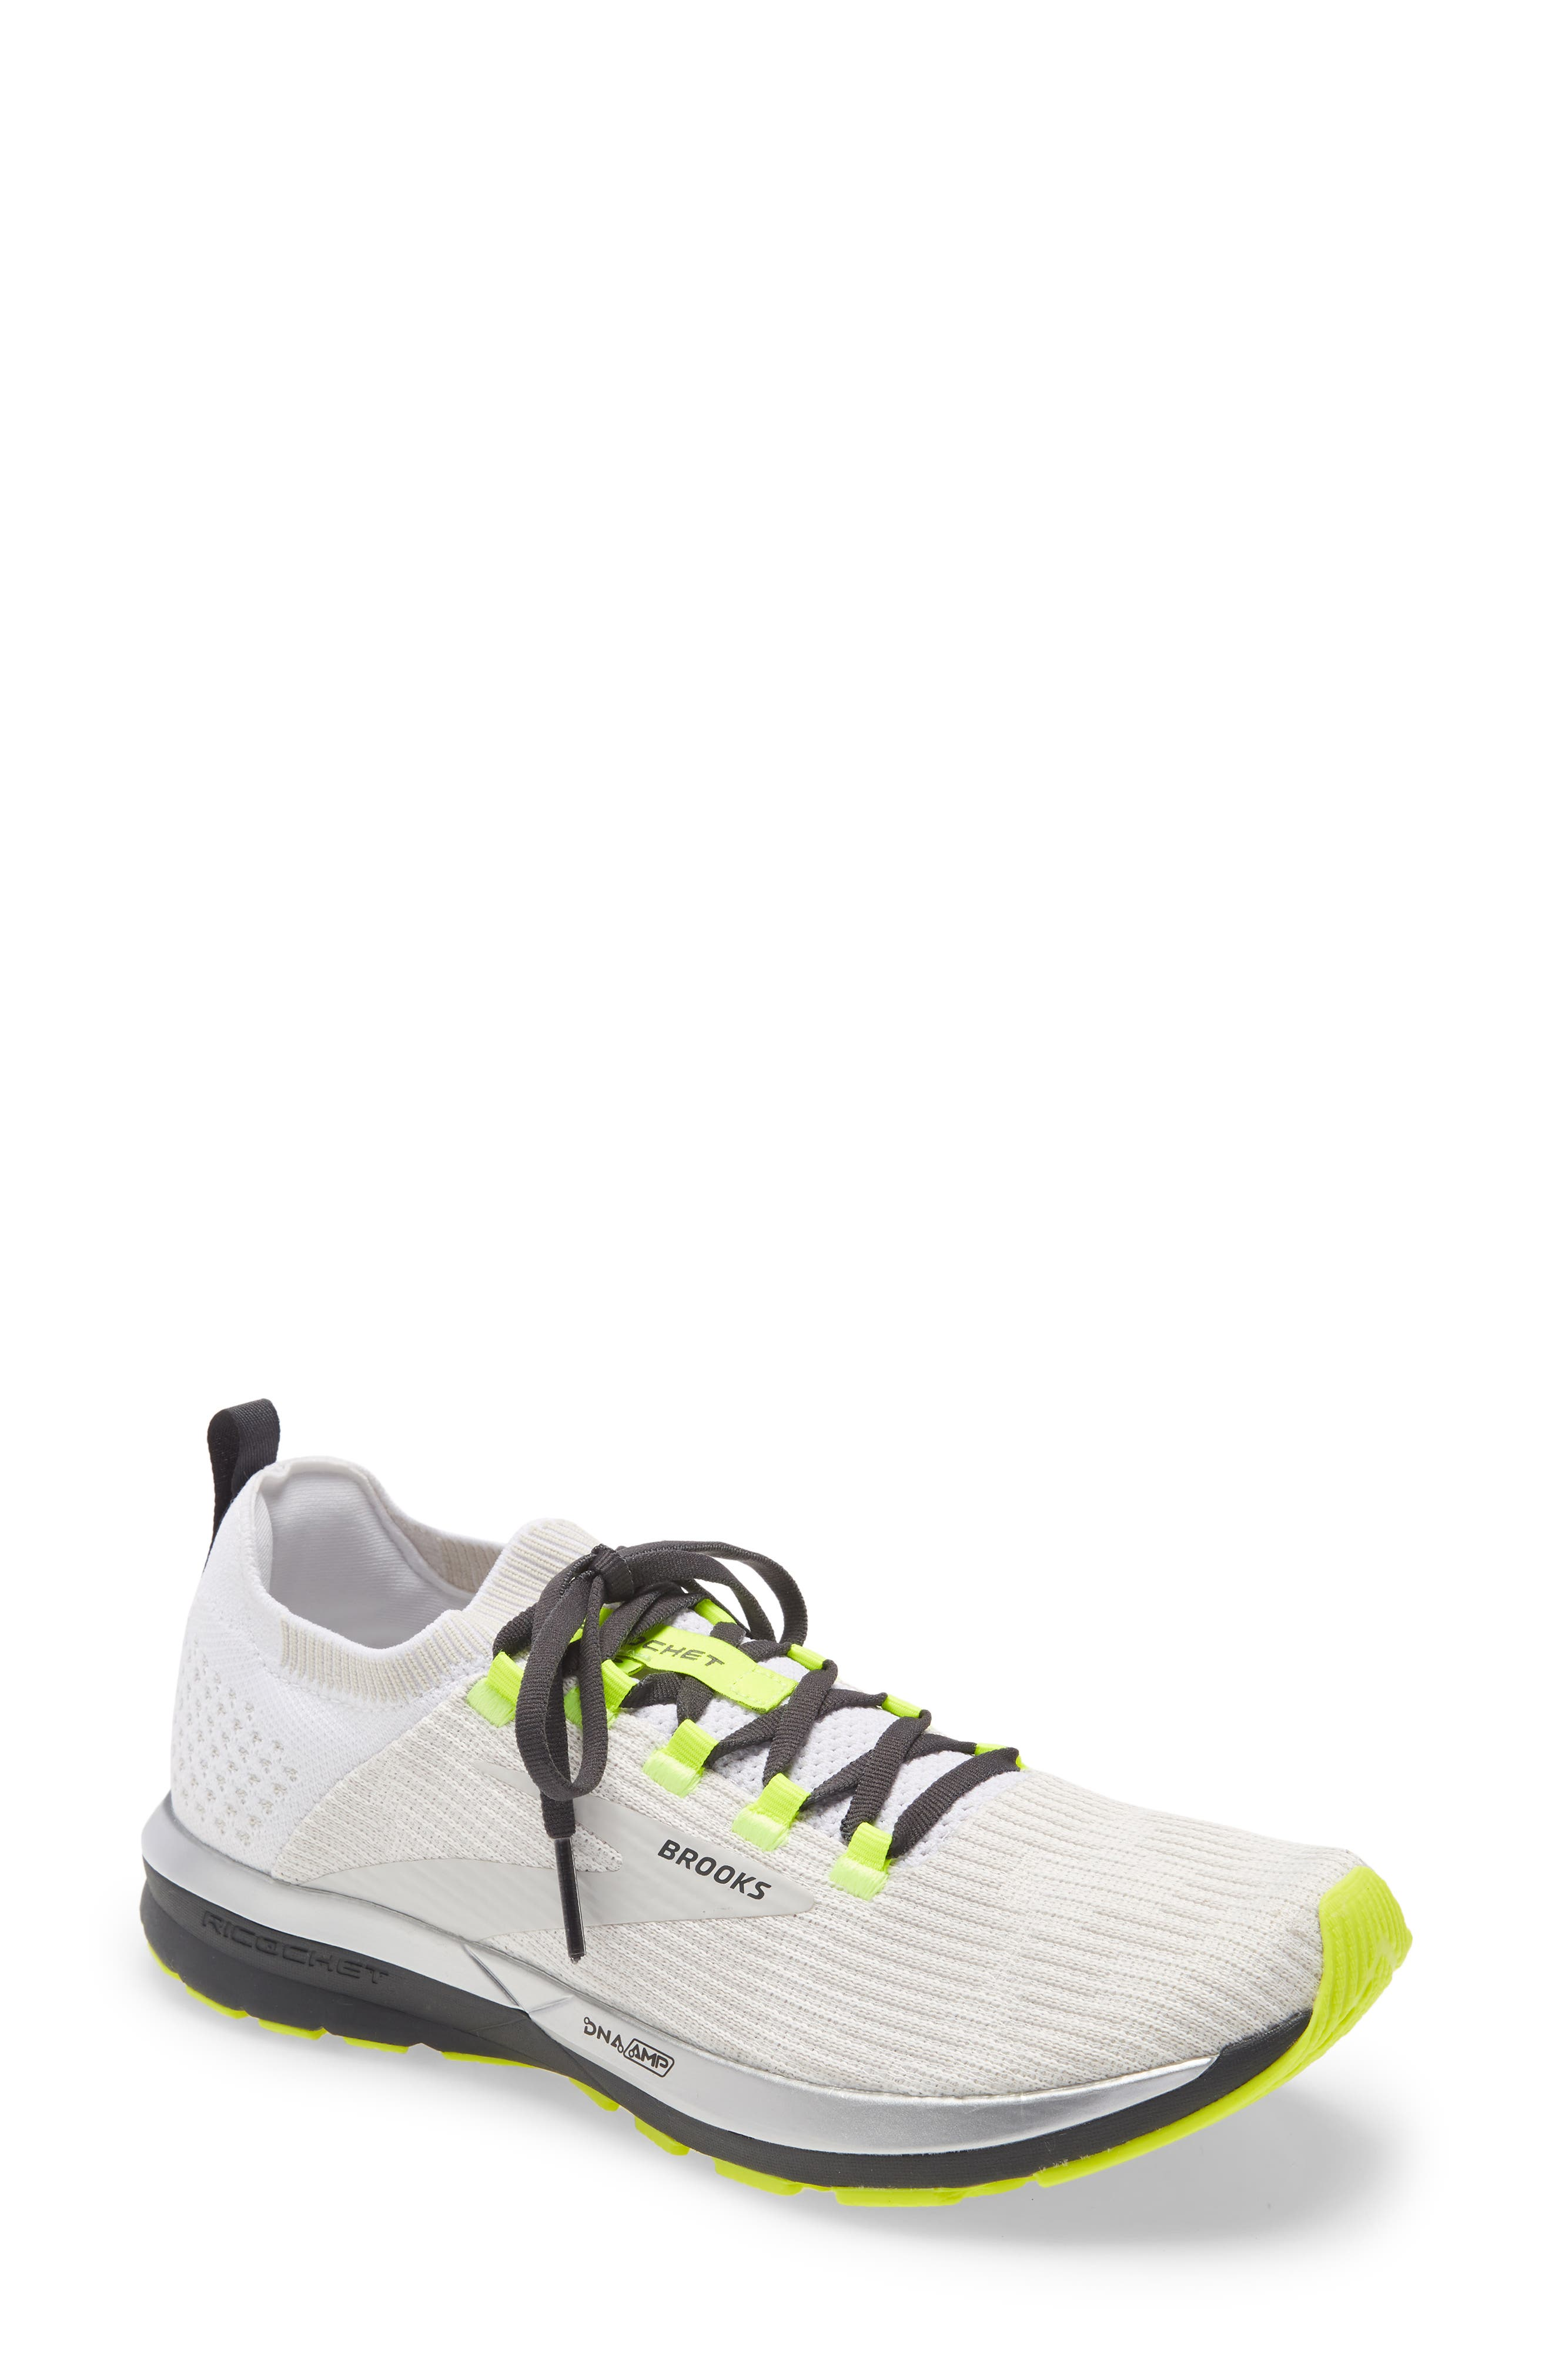 Ricochet 2 Running Shoe